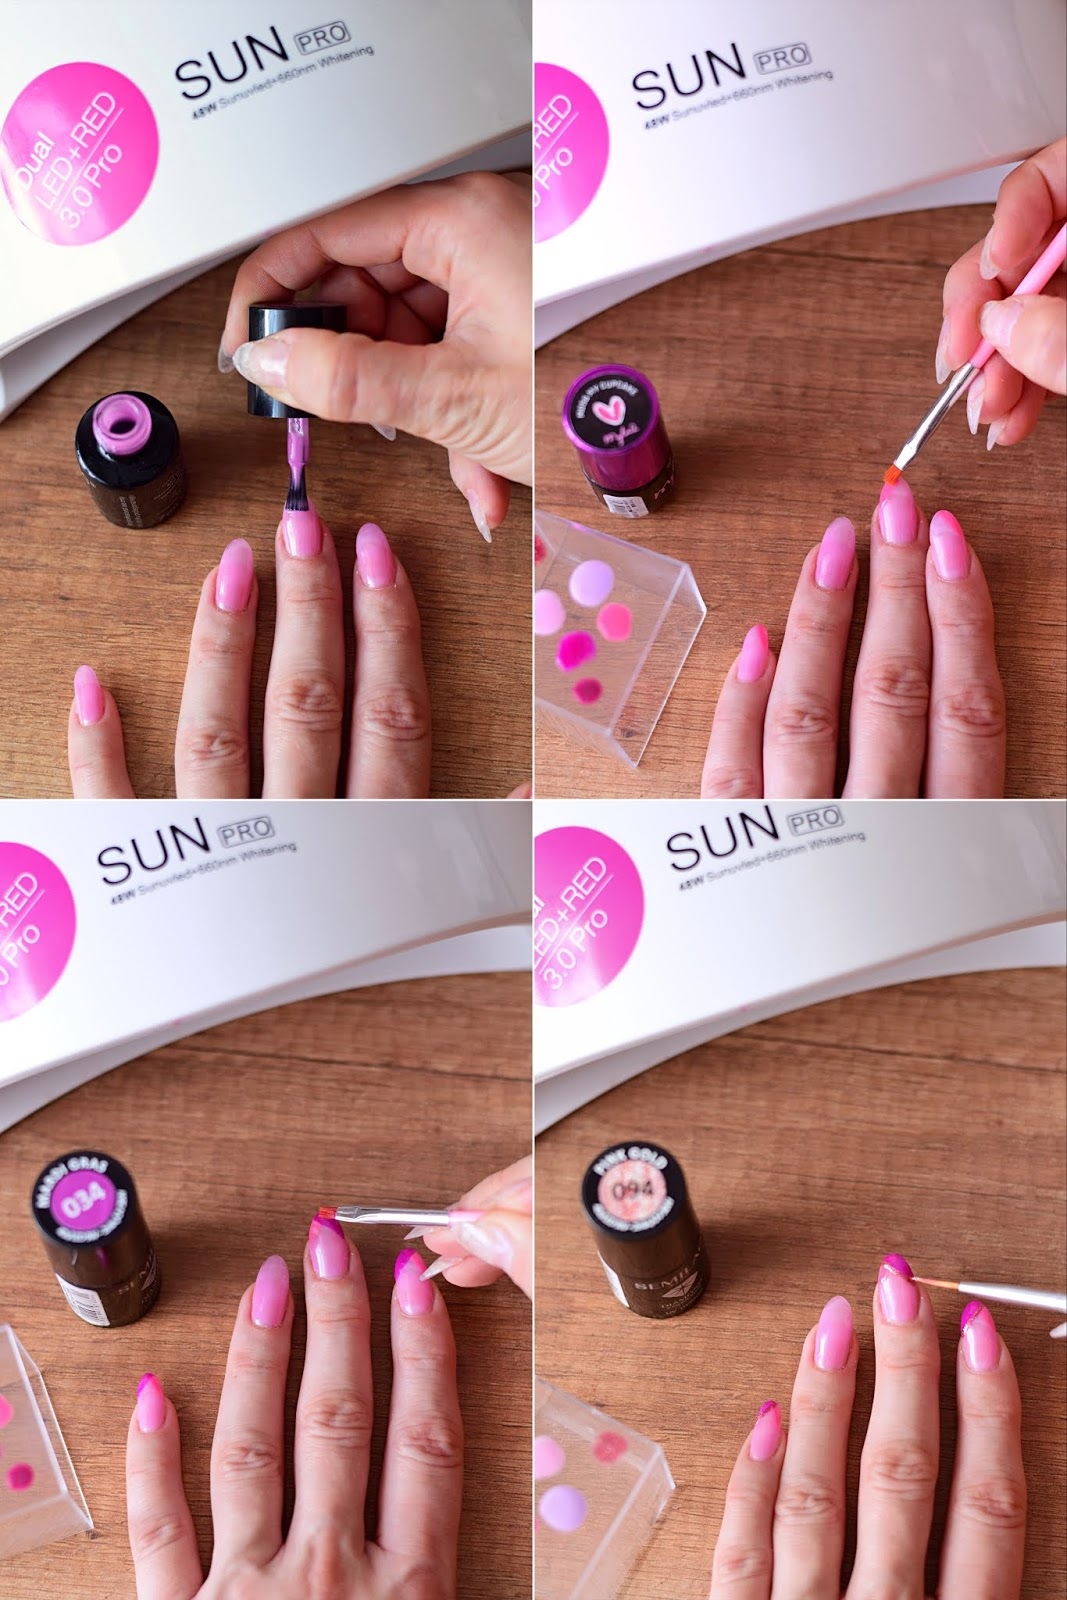 manicure_na_lato_paznokcie_lato_wakacje_french_francuski_kolorowe_końcówki_blog_tutorial_krok_po_kroku_pomysł_na_letnie_paznokcie